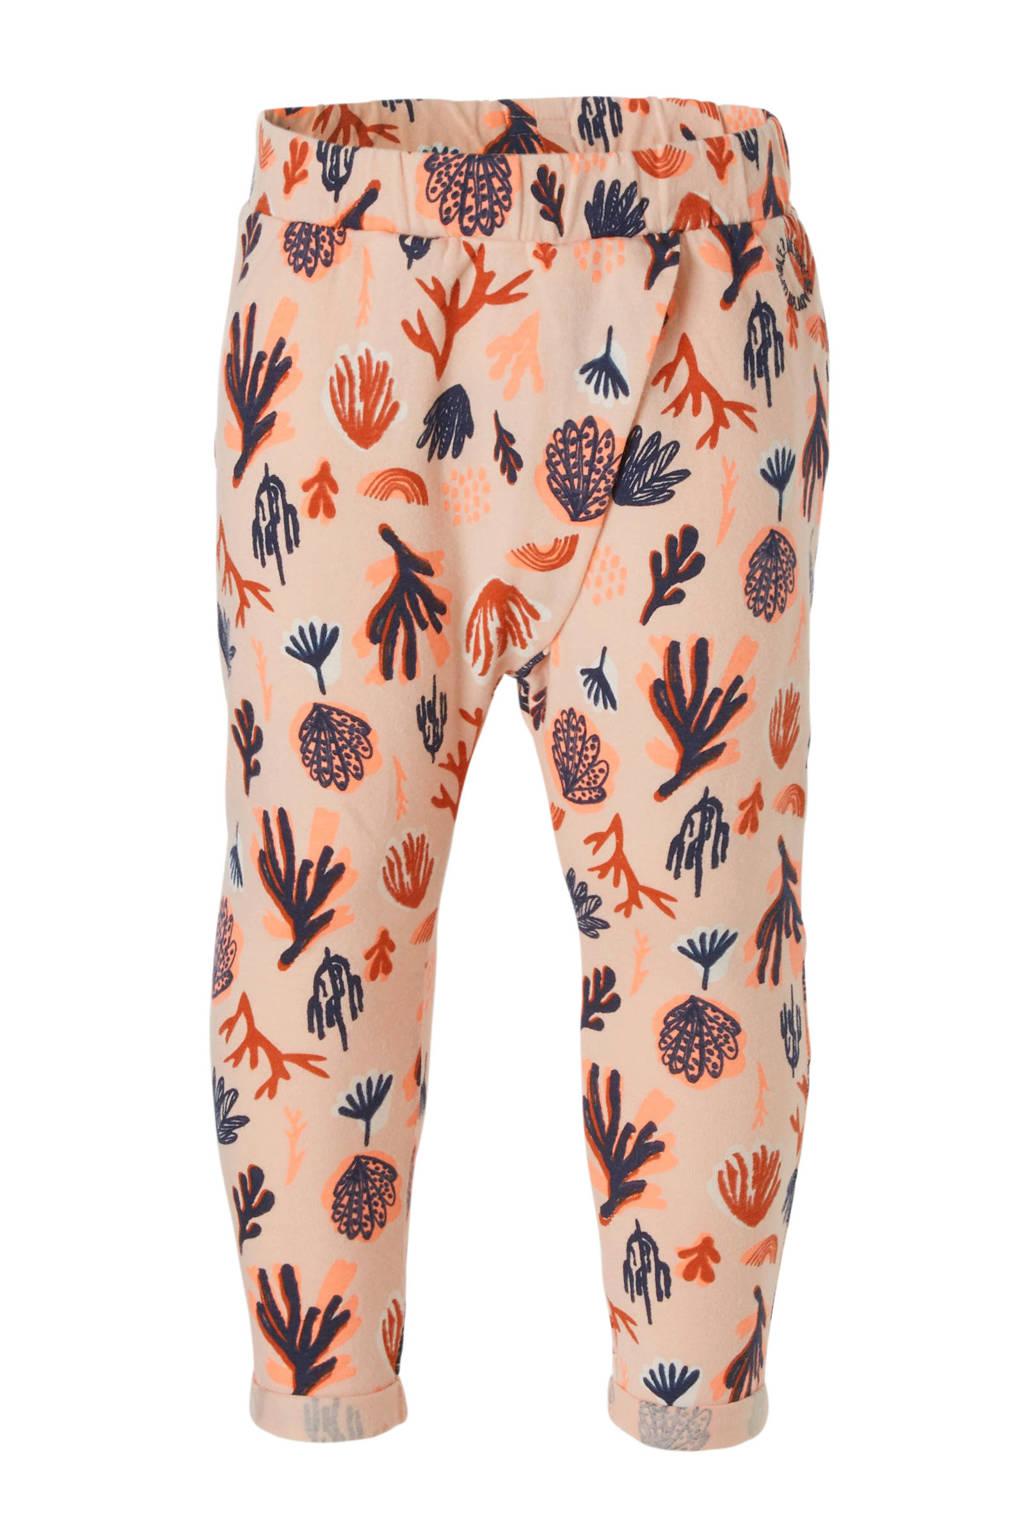 Tumble 'n Dry Lo broek Ernie met allover print perzikkleur, Perzikkleur